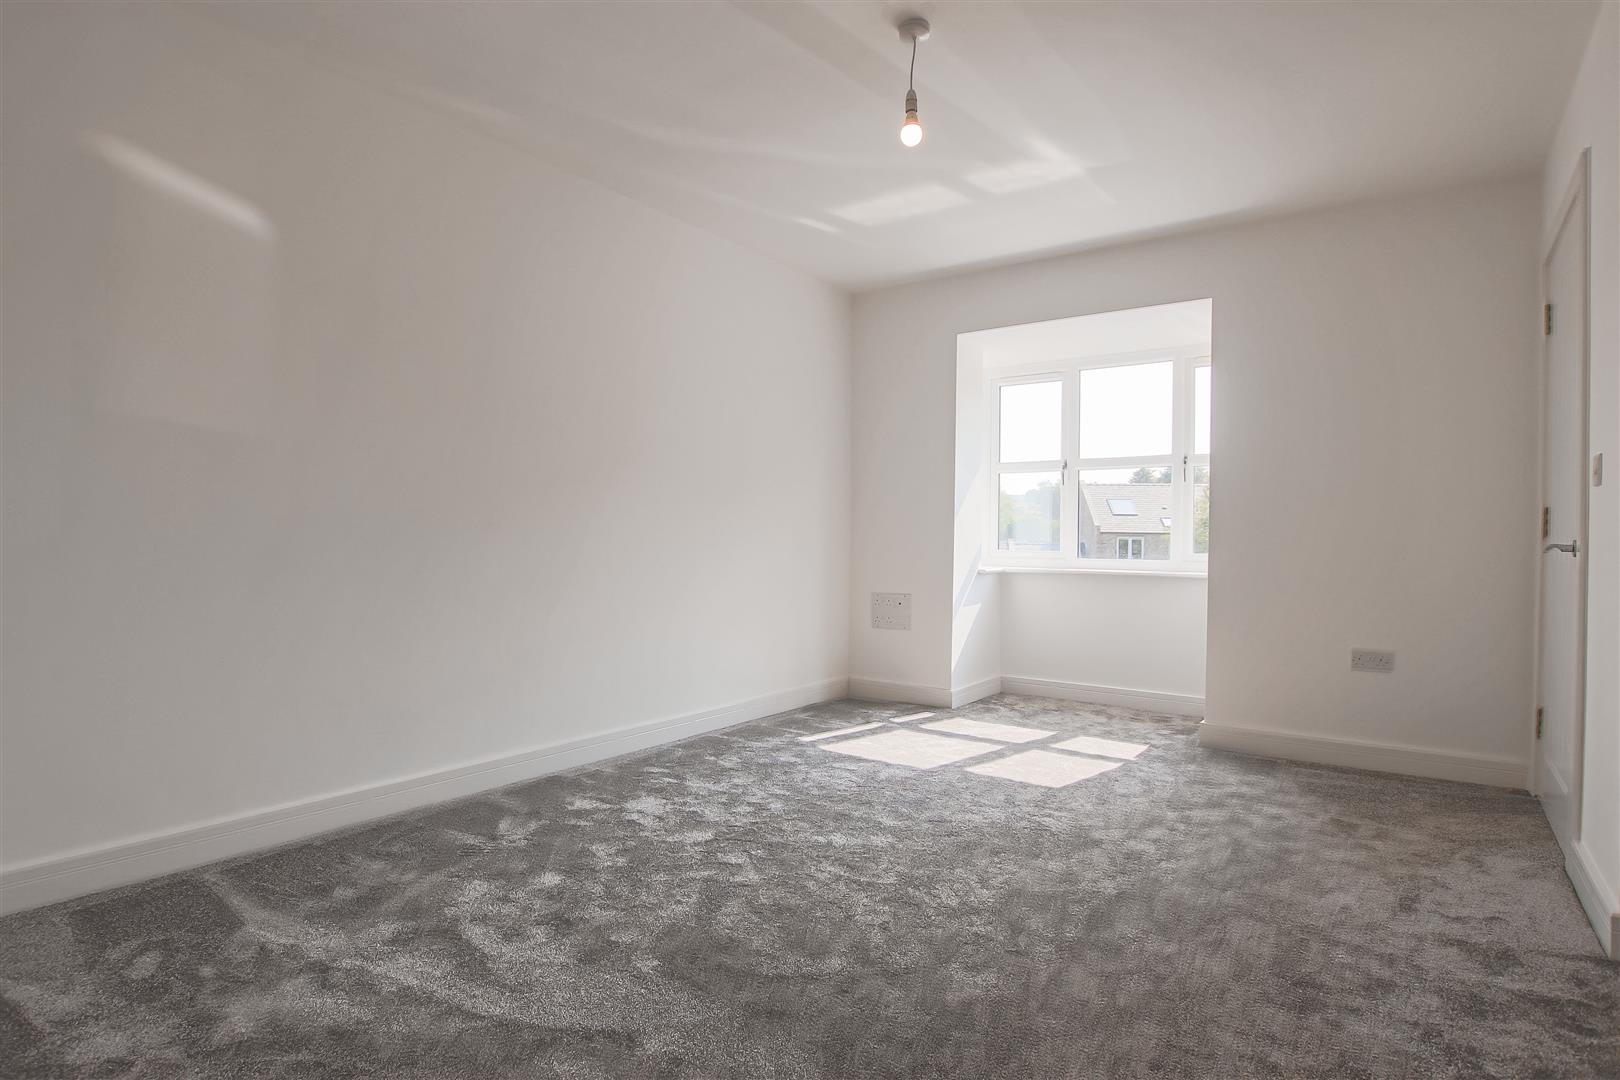 4 Bedroom Detached House For Sale - Show Home Reception Room (3).jpg